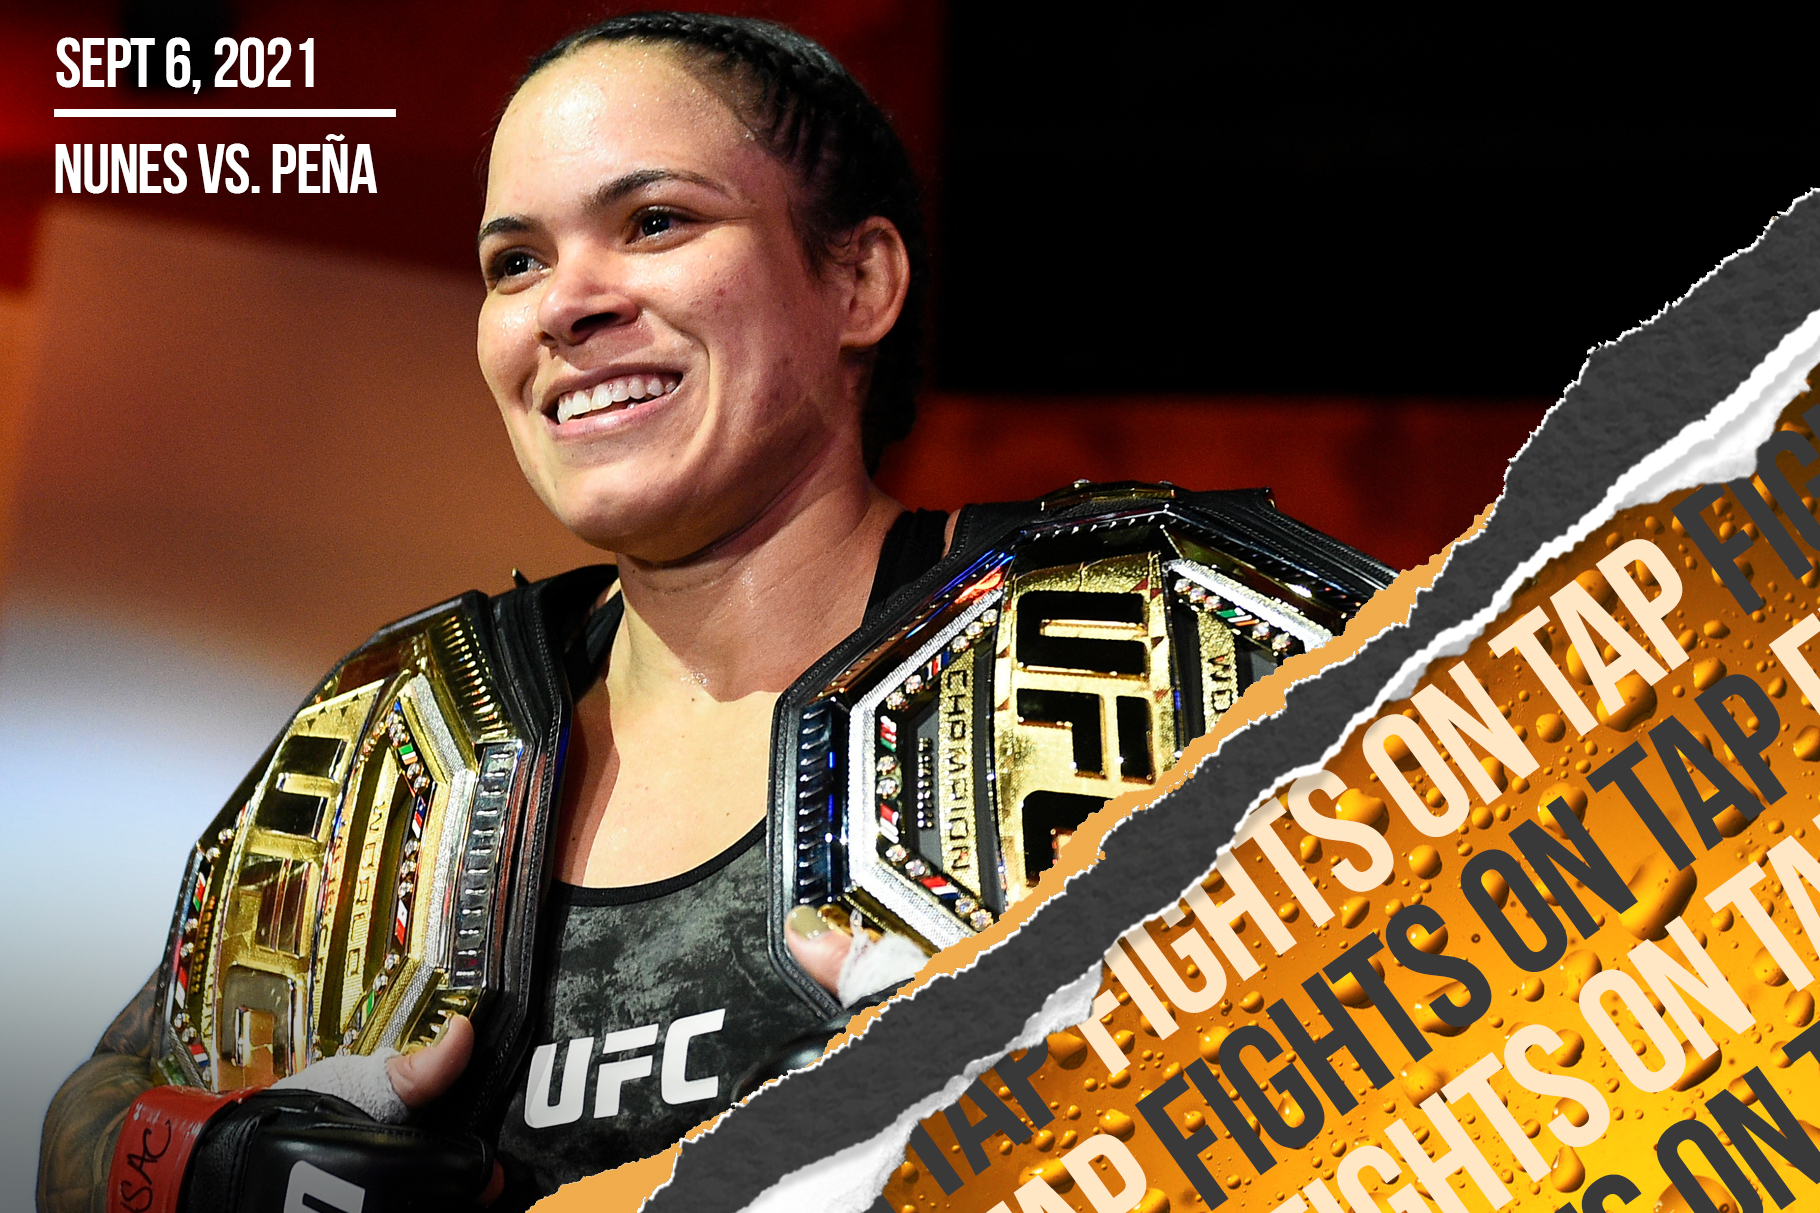 Fights on Tap: Amanda Nunes vs. Julianna Peña among 16 UFC fights announced